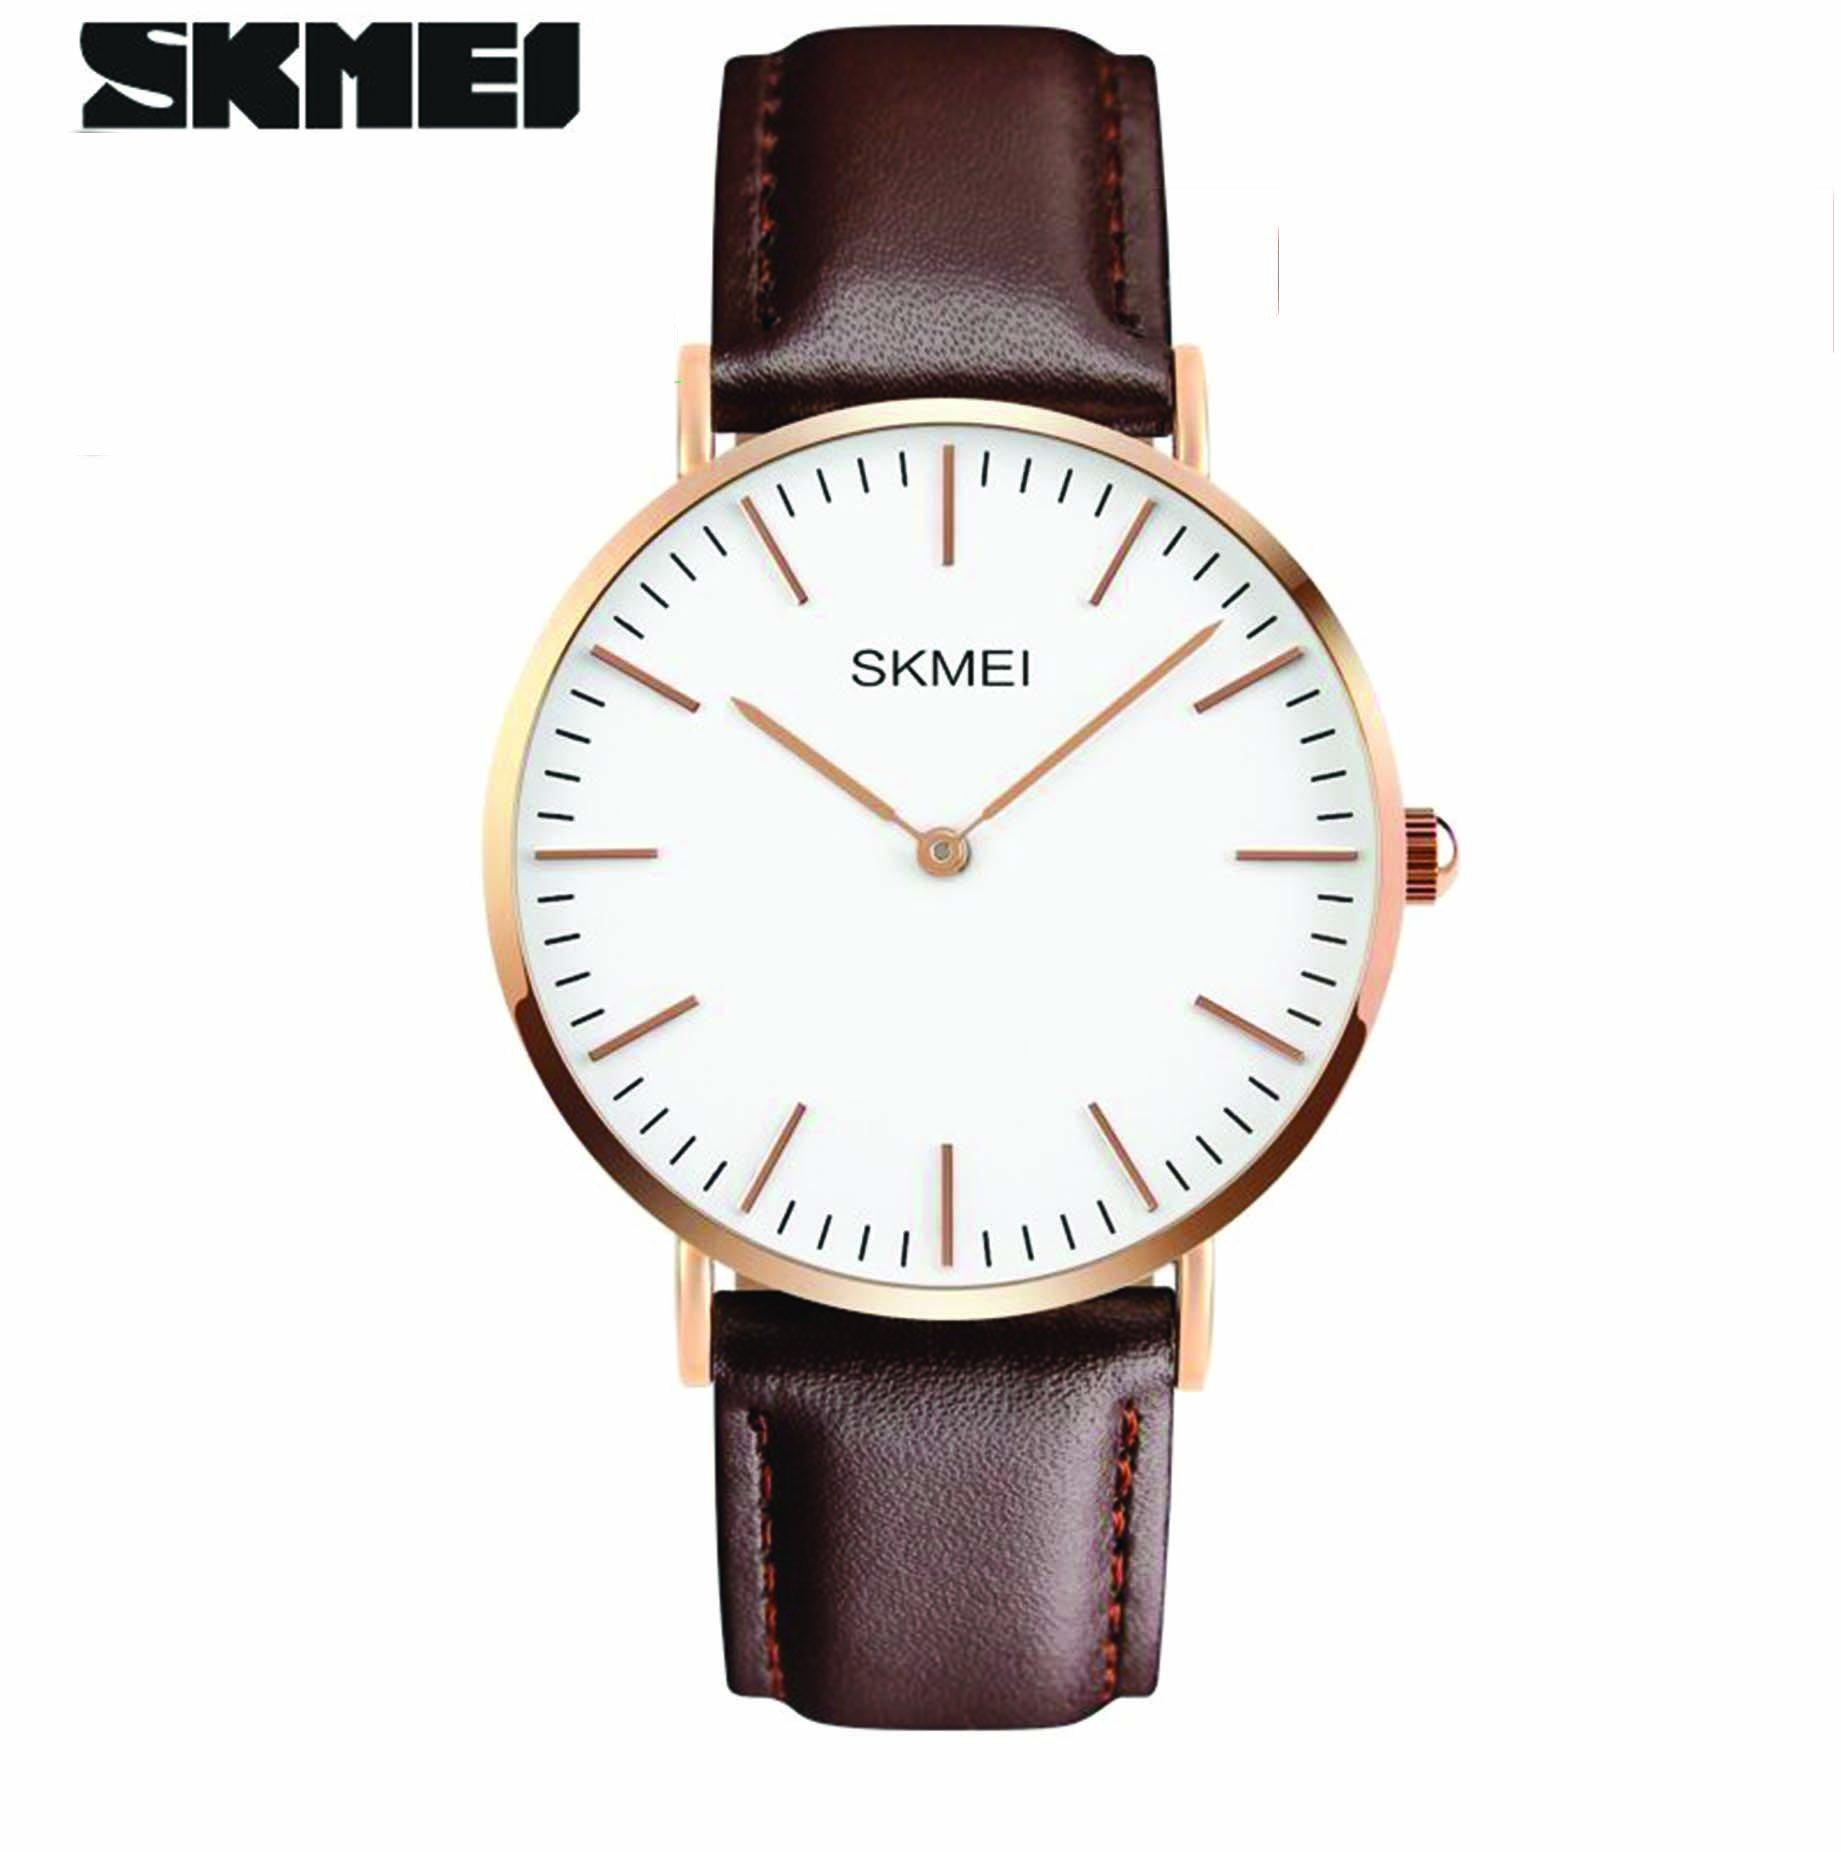 Jam Tangan Pria SKMEI Analog Casual Men Leather Watch Original 1181CL Coklat